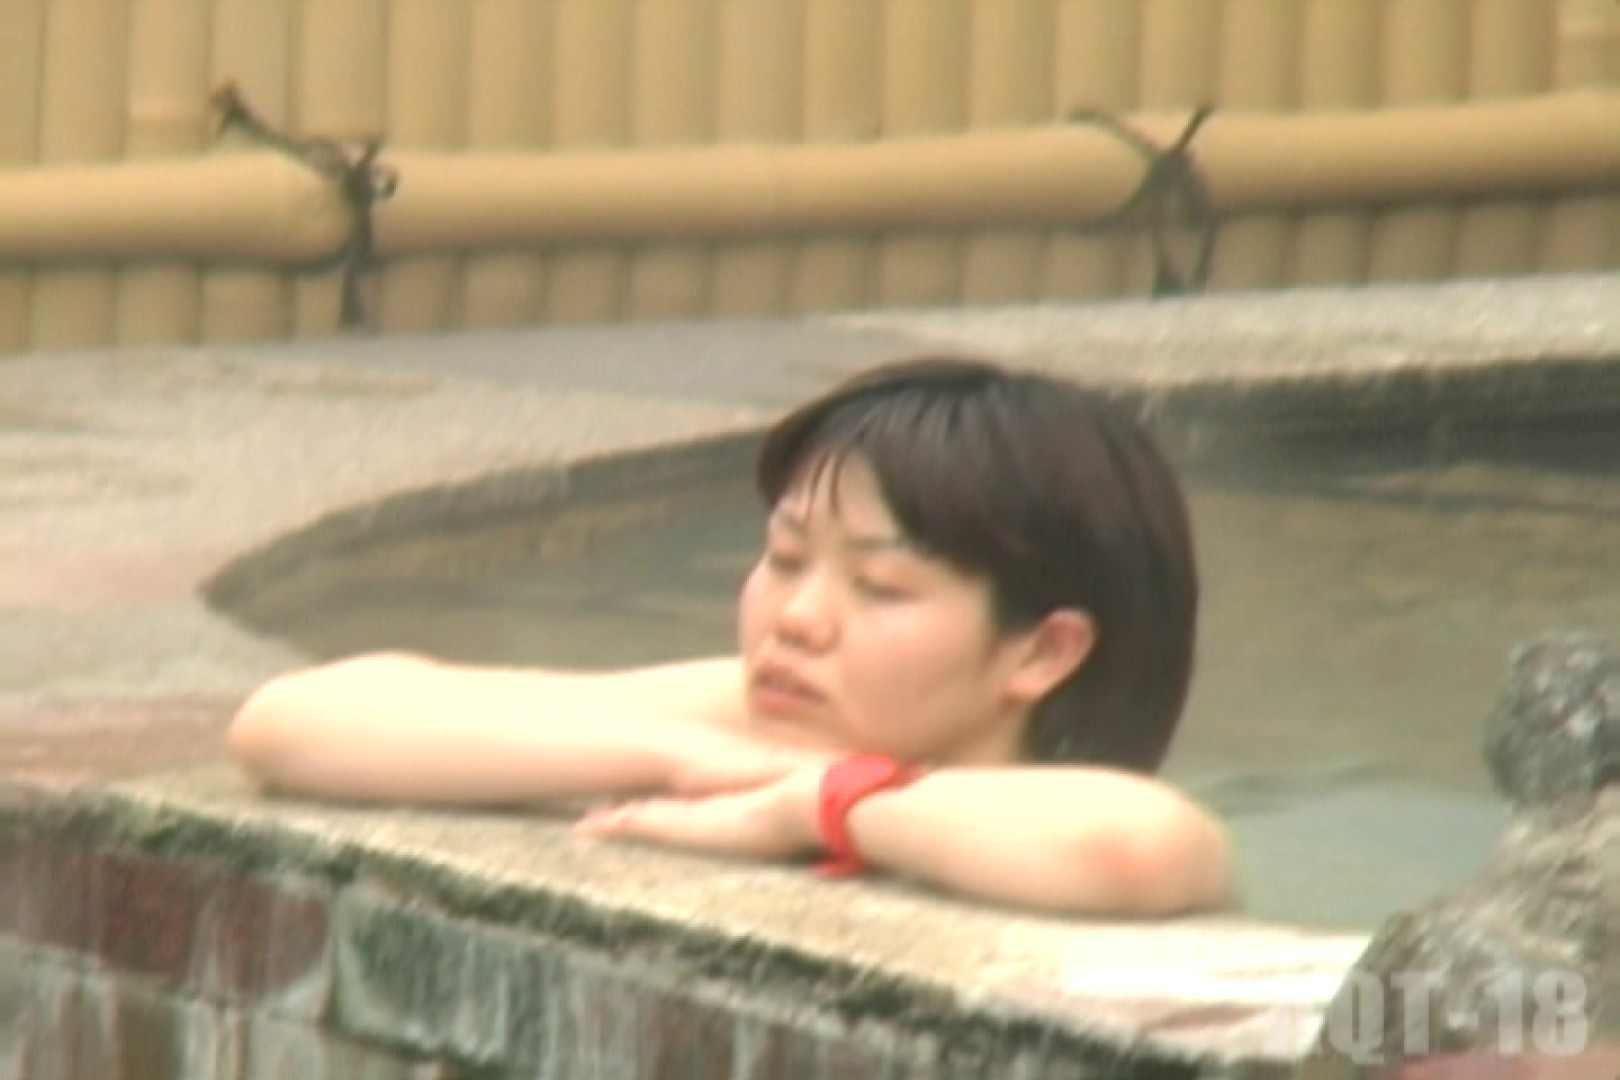 Aquaな露天風呂Vol.861 0   0  87連発 63